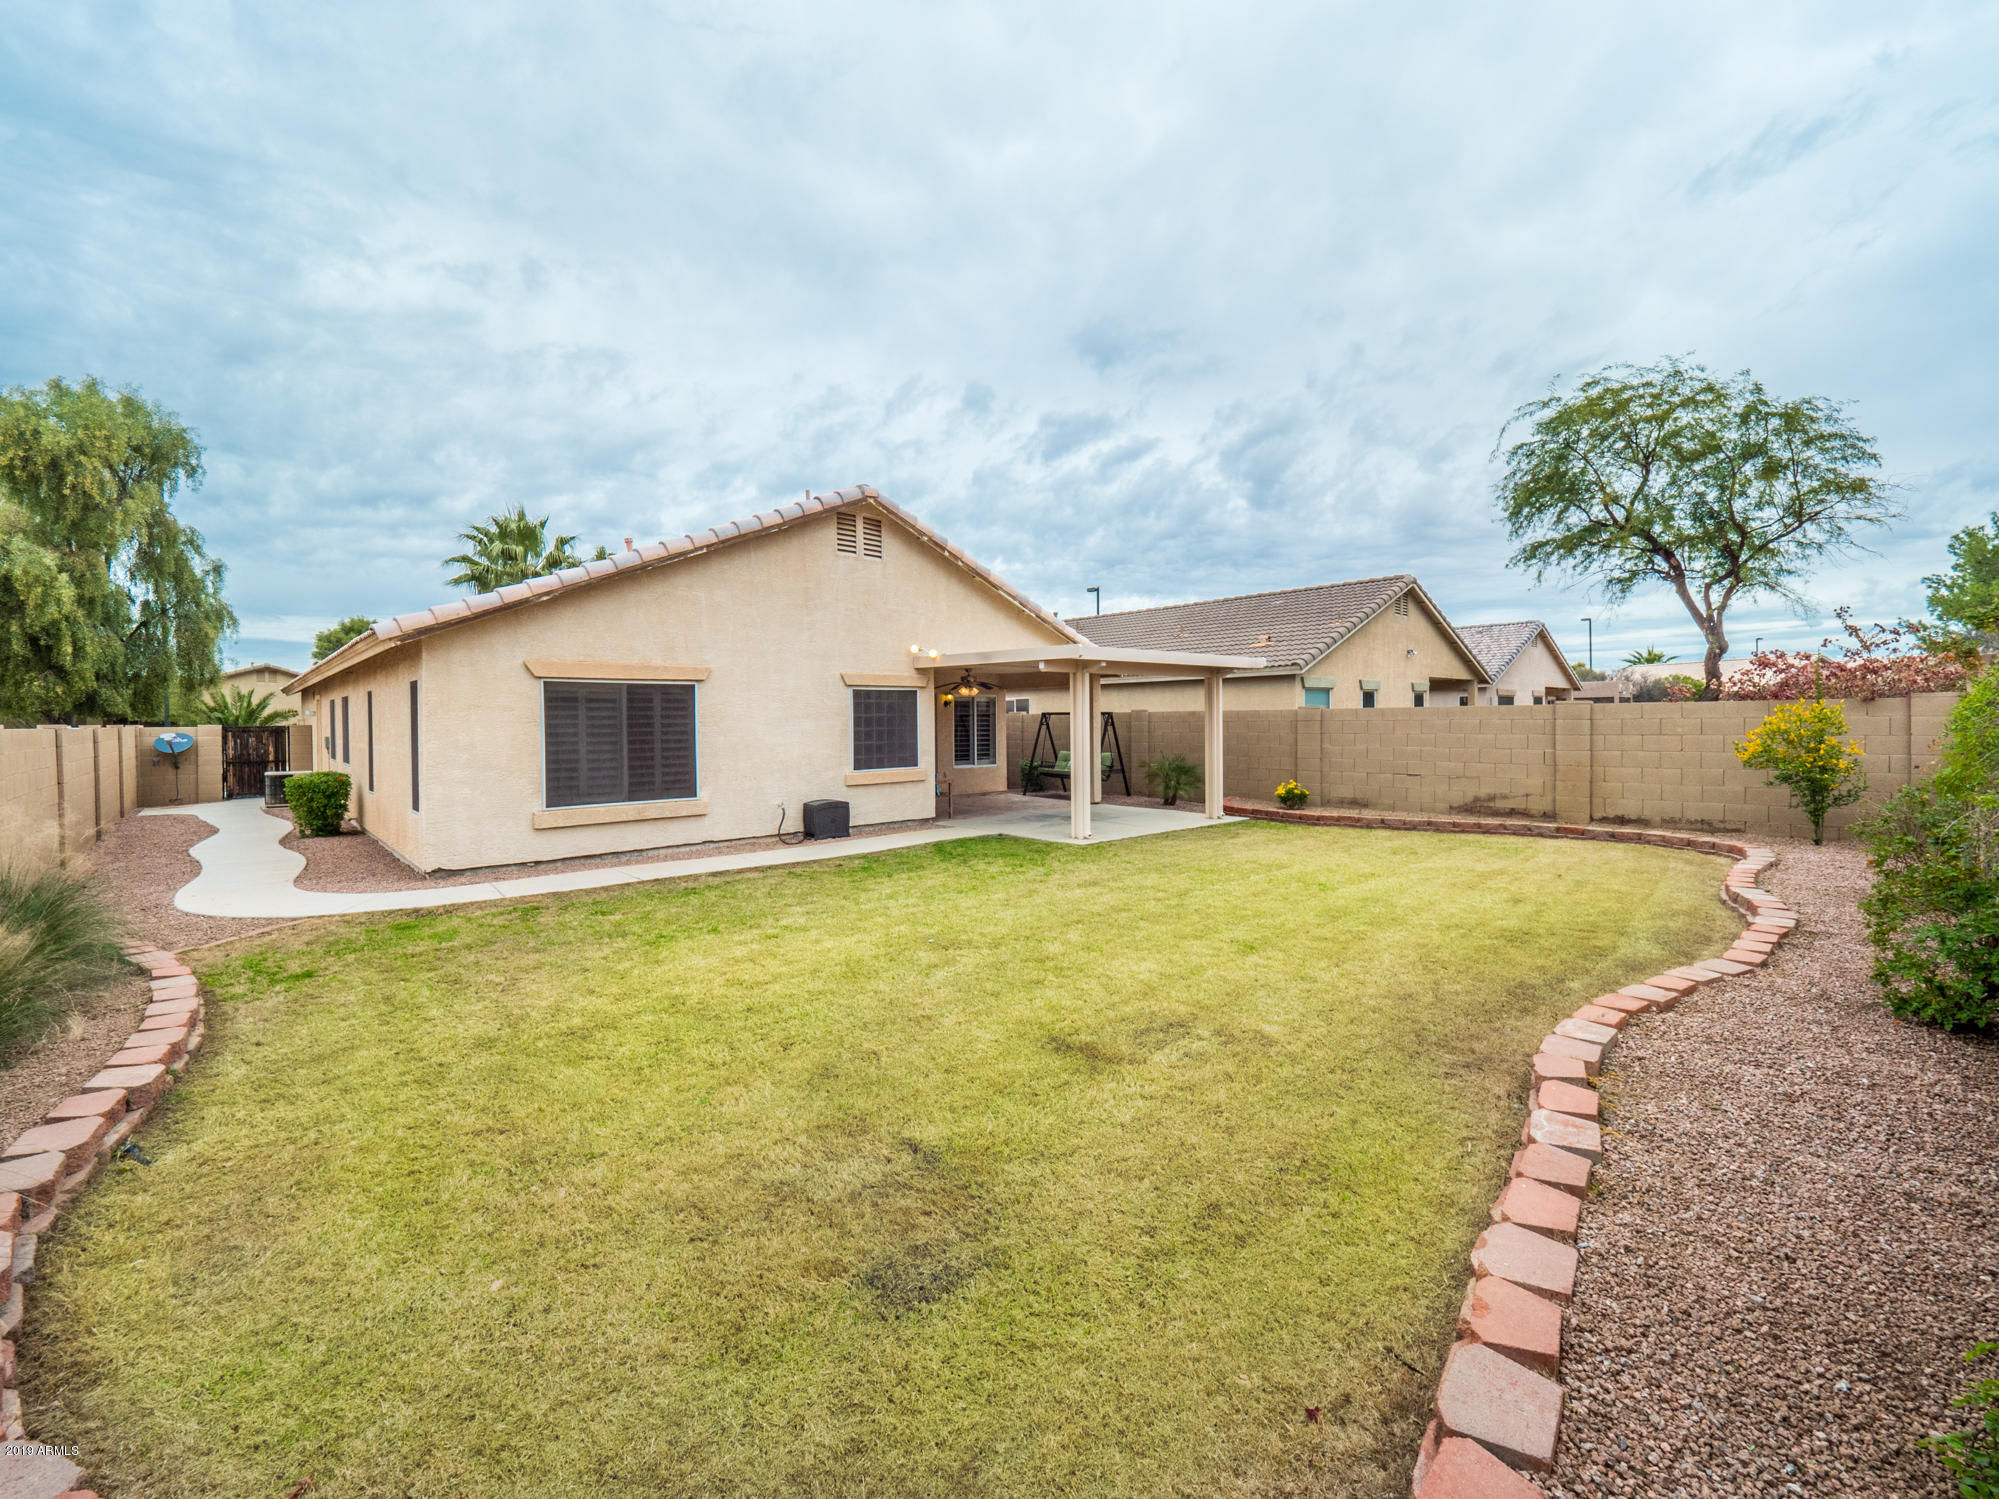 MLS 5869277 3545 E THUNDERHEART Trail, Gilbert, AZ 85297 Gilbert AZ San Tan Ranch